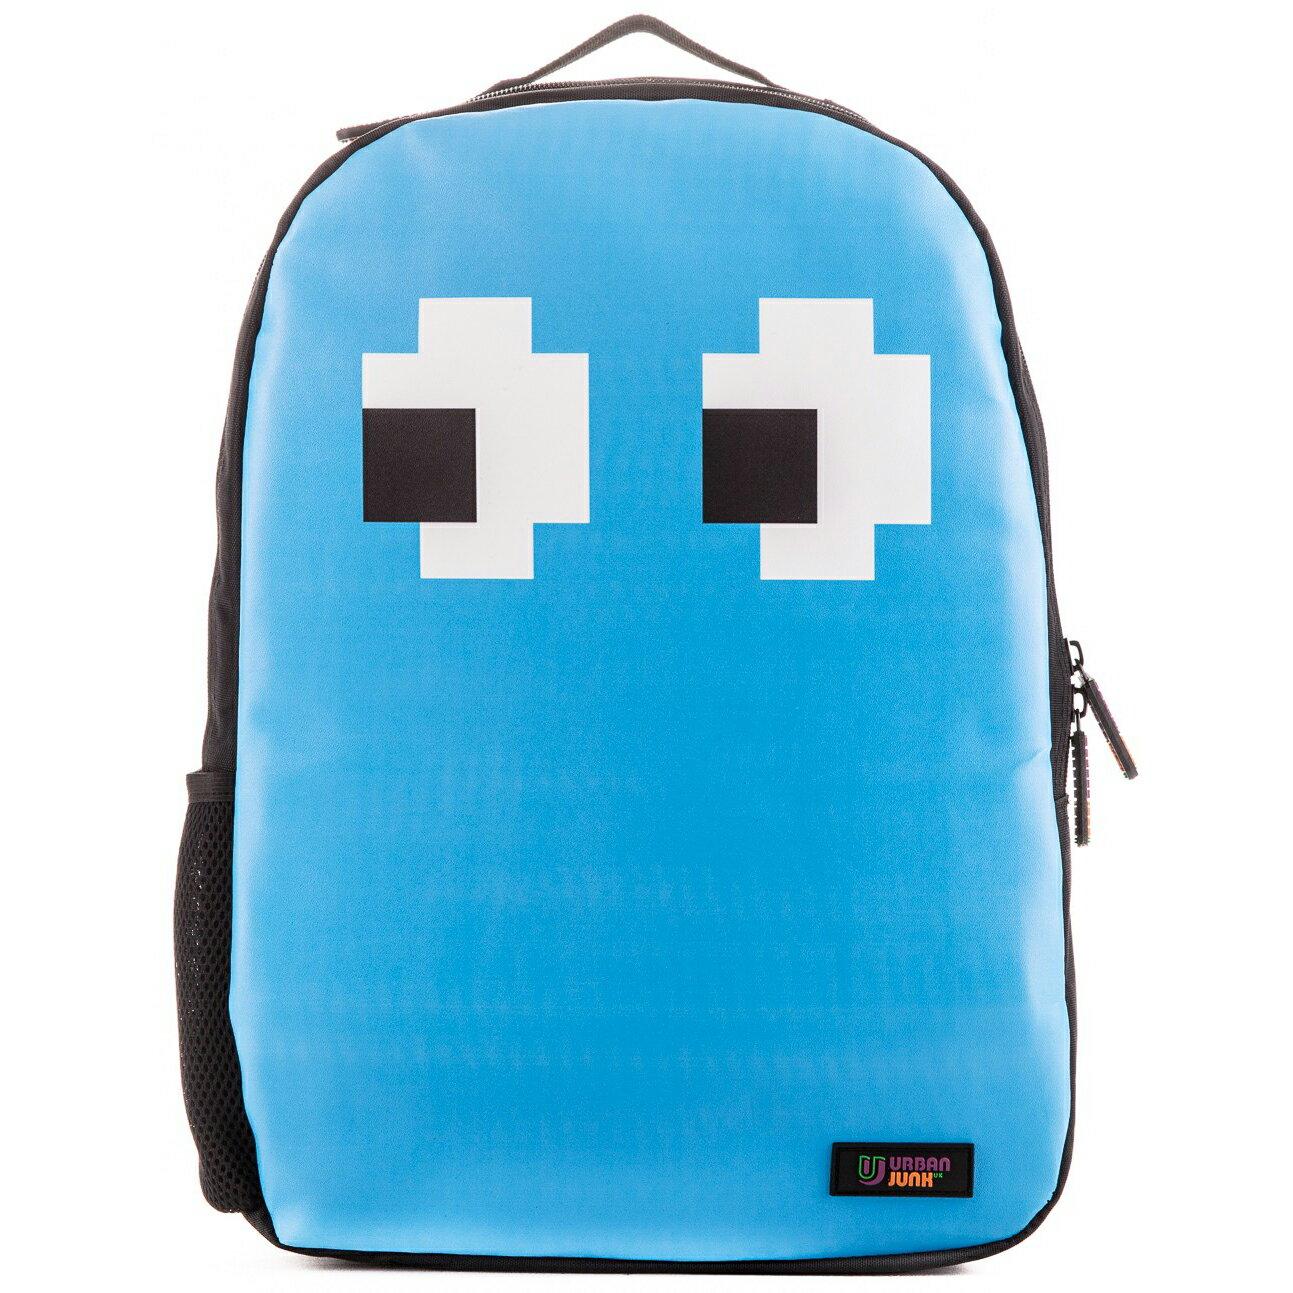 Urban Junk Bluey Student Backpack 0